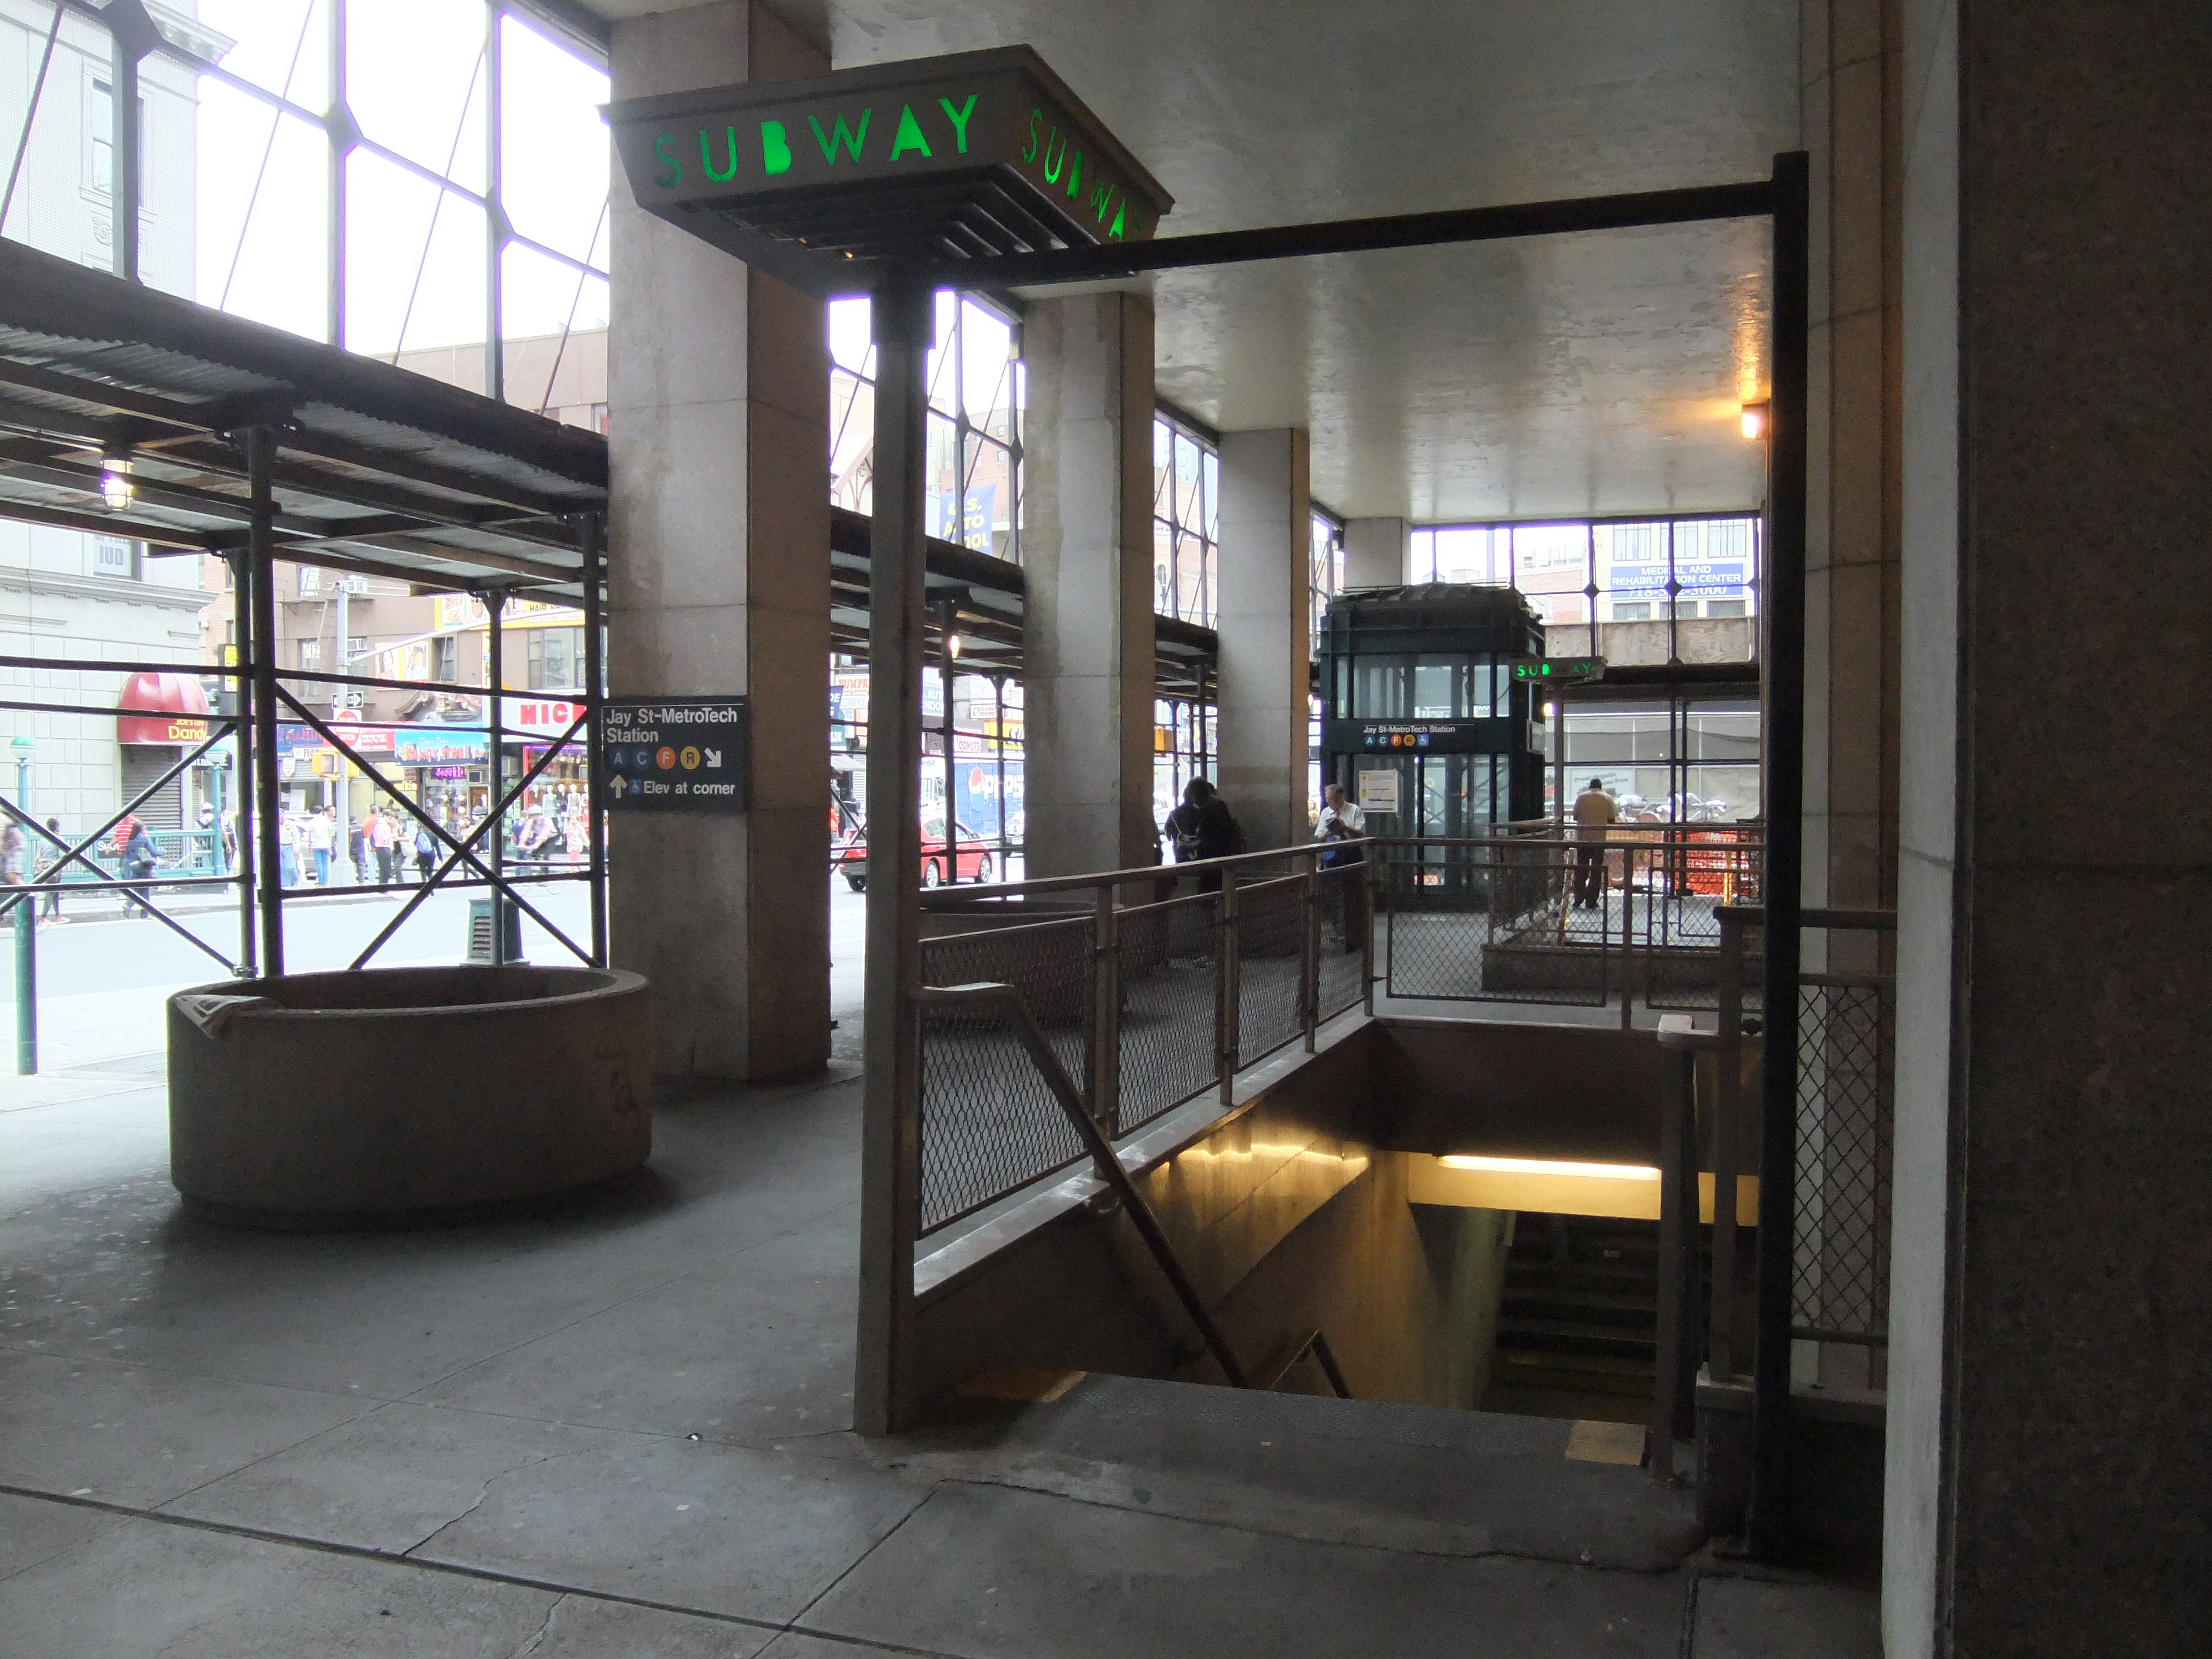 Jay Street Borough Hall Subway Map.Jay Street Metrotech Station Wikipedia